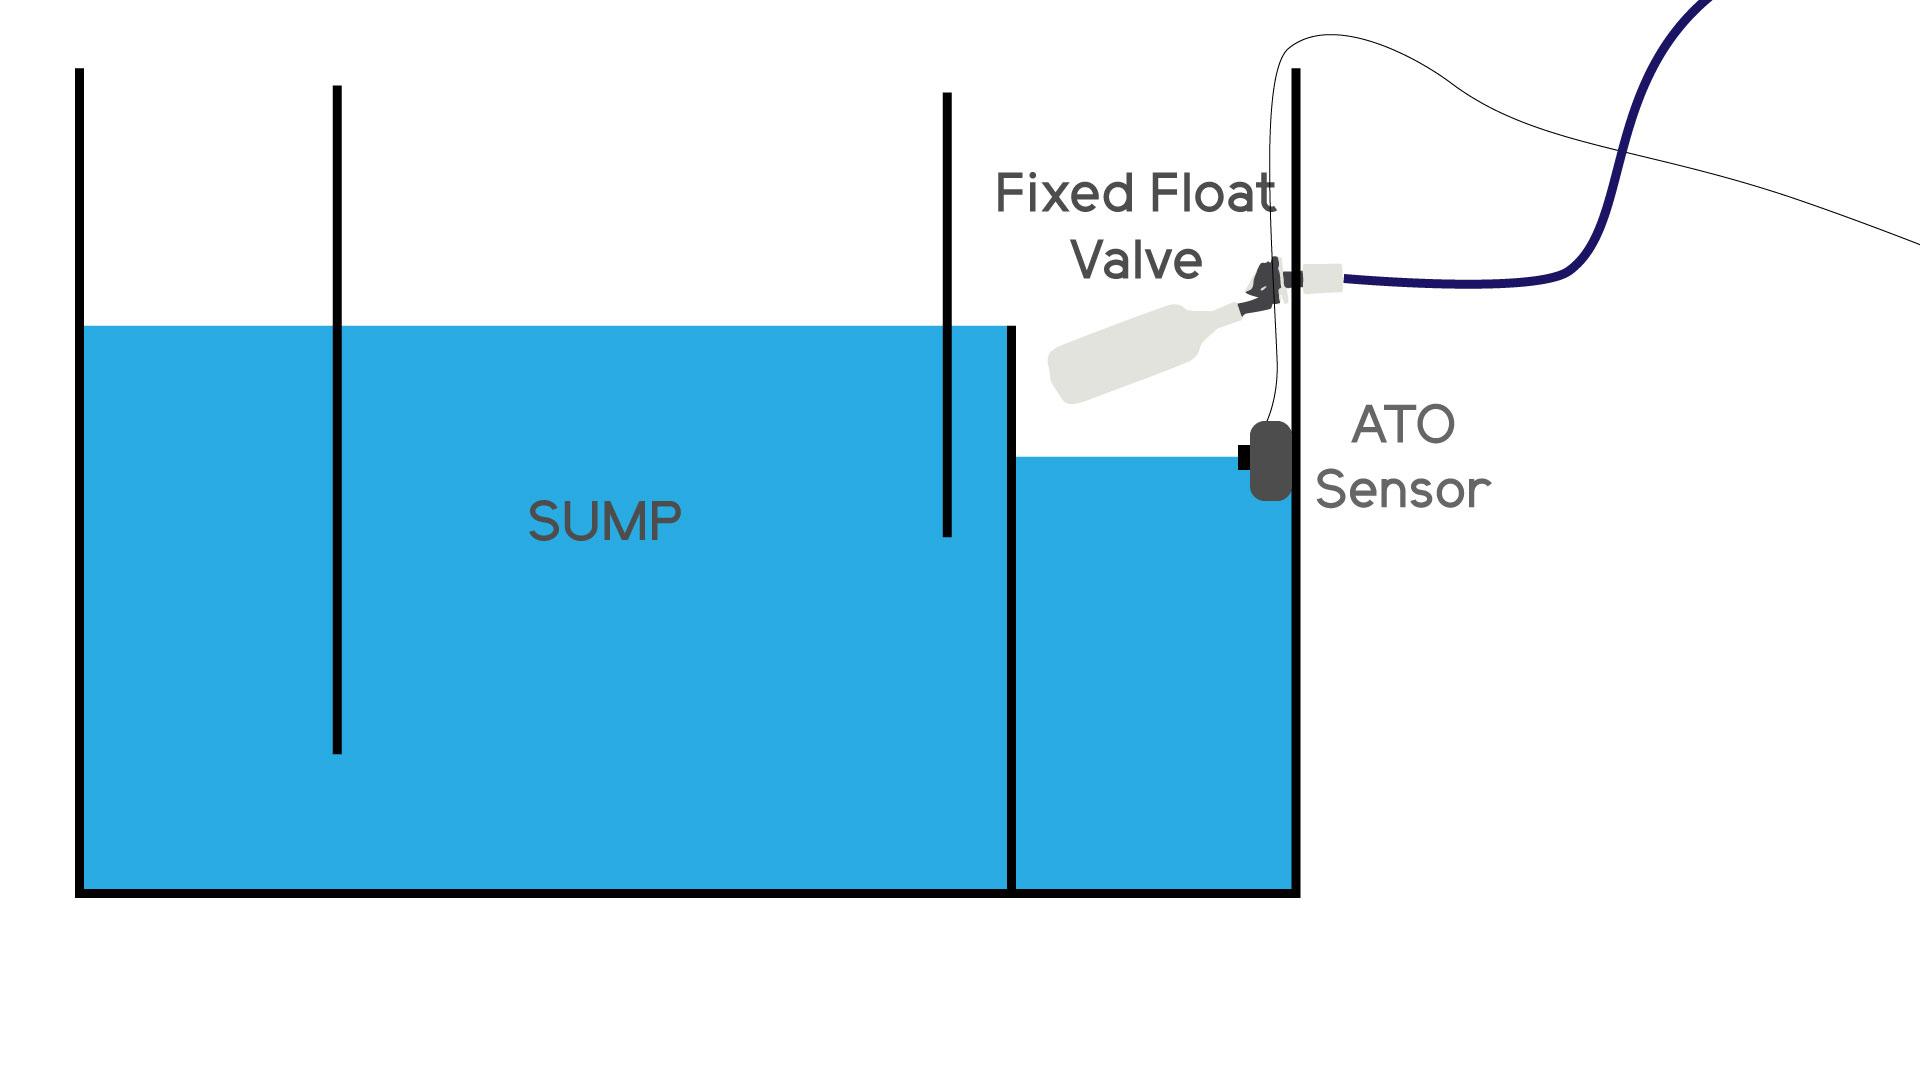 Wiring Diagram Also Float Level Control Valve Symbol Besides Float